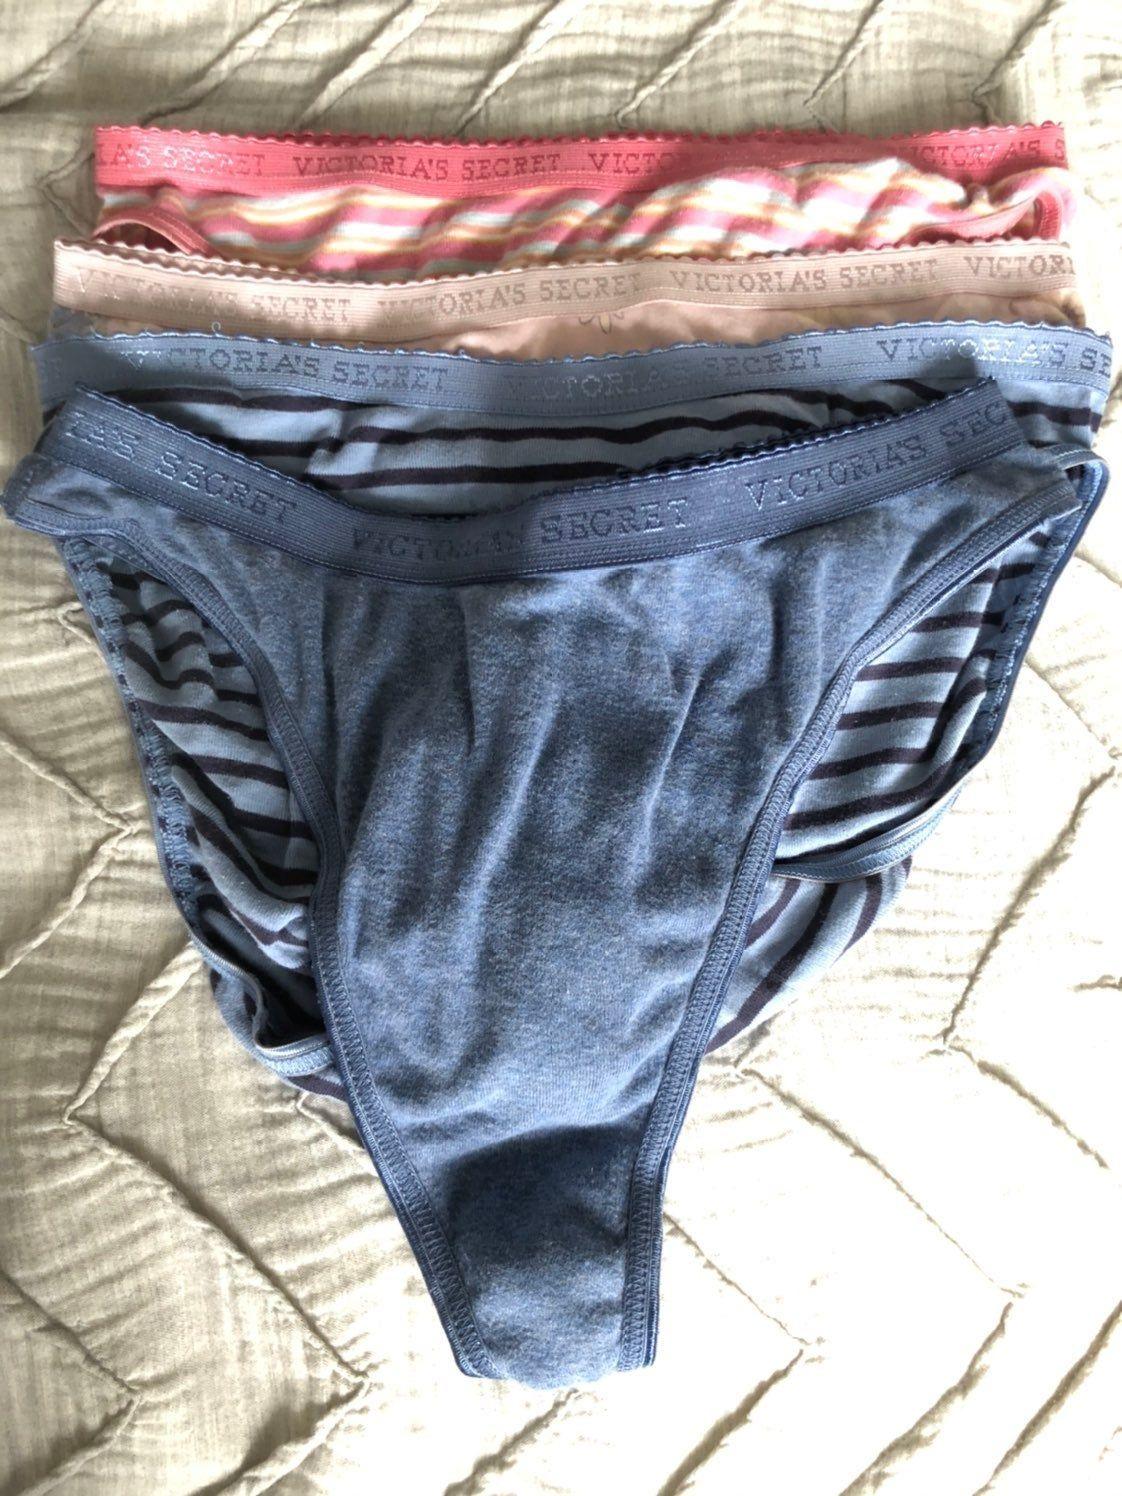 2 Victoria/'s Secret VINTAGE 100/% Cotton Signature V-String Thong Panty SMALL